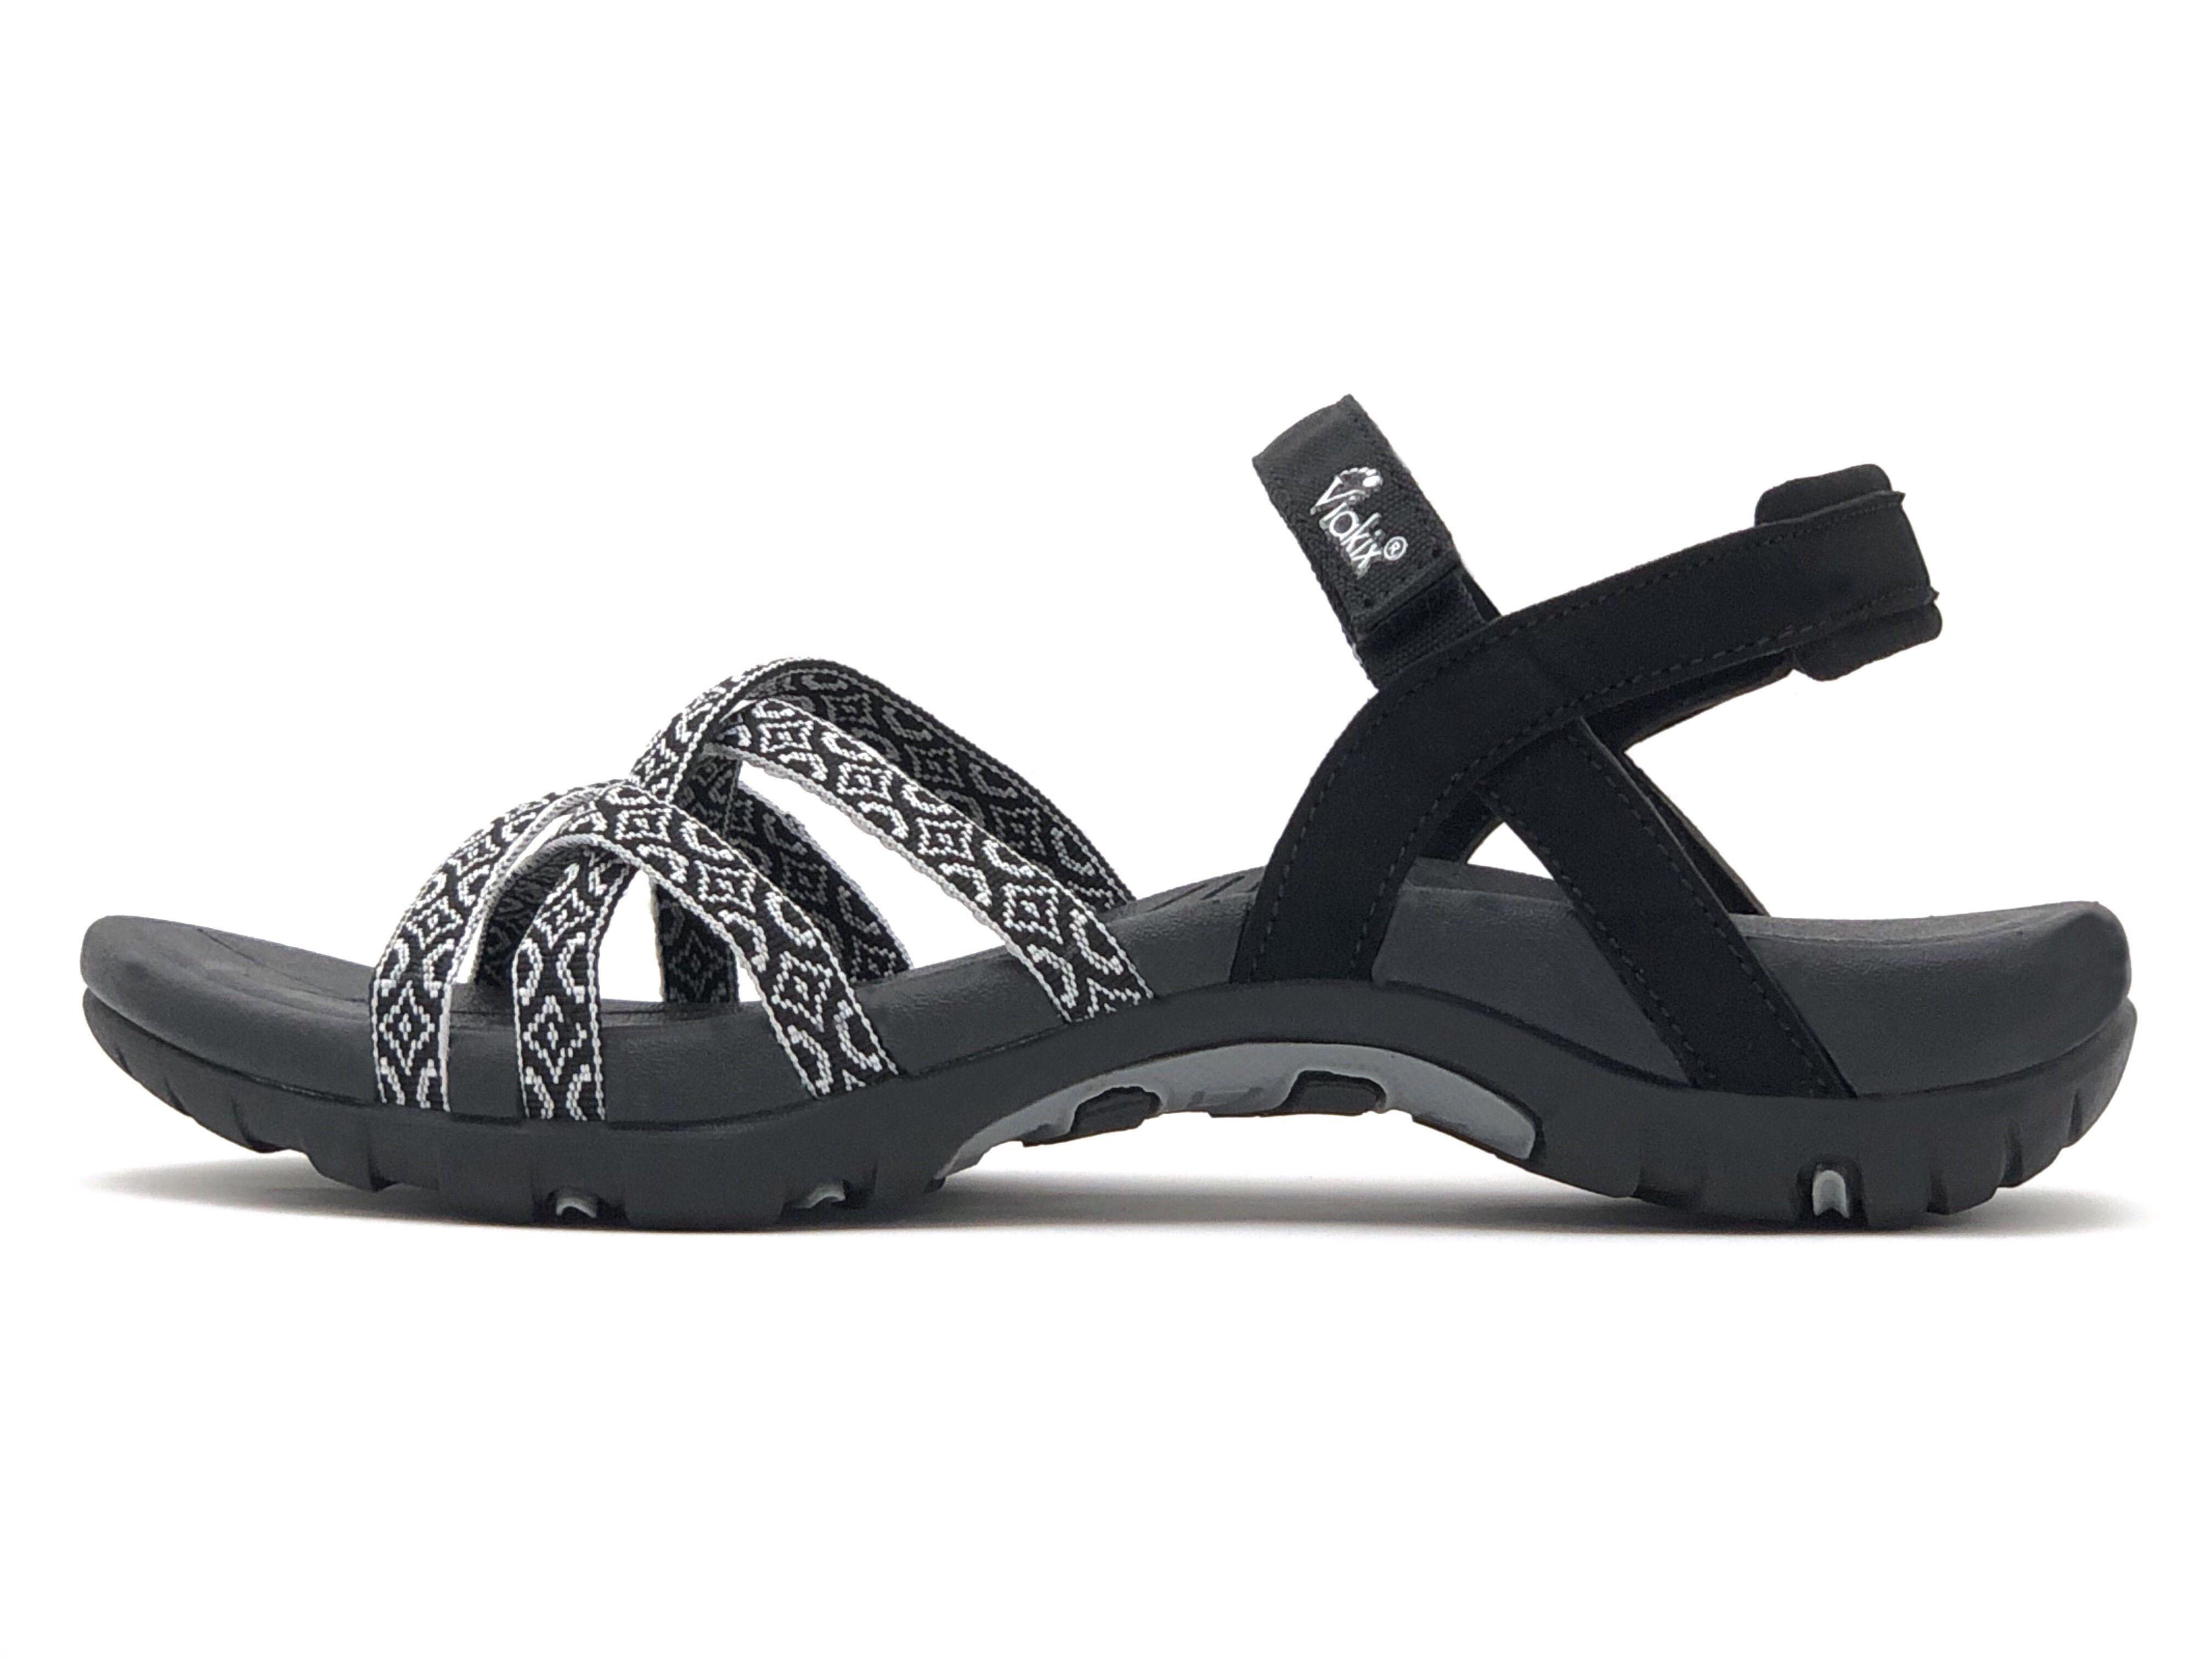 Comfortable Walking Sandals Athletic Outdoor Sandals By Viakix Reebok Shoes Women Best Walking Sandals Comfortable Walking Sandals